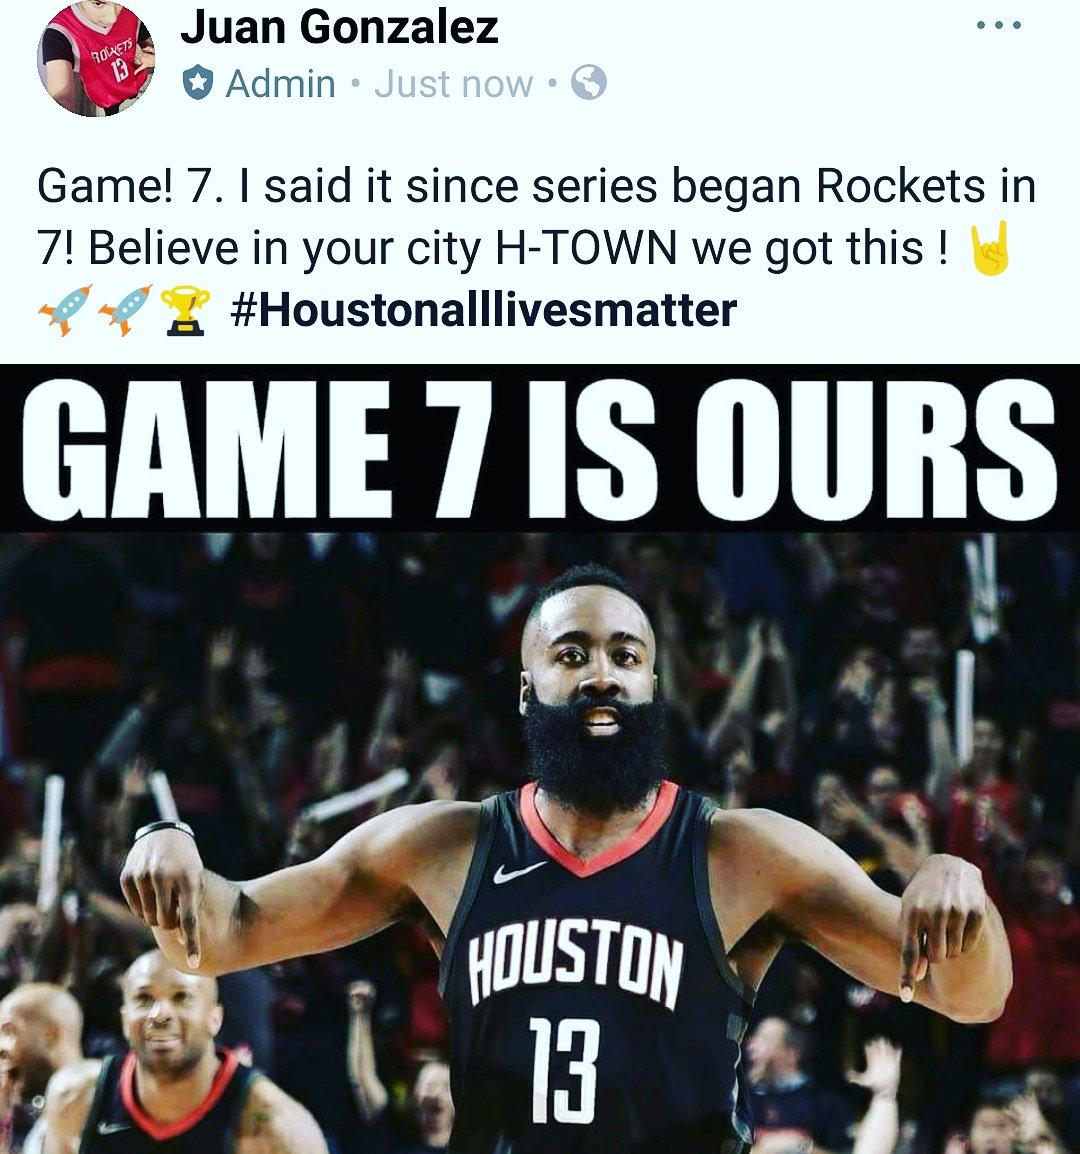 Rockets in 7 ! #Houstonalllivesmatters #HoustonRockets #Rockets  #NBA  #jamesharden  #FOLLOWME  #follow4follow  #follo4follo<br>http://pic.twitter.com/Zz94vjji5H